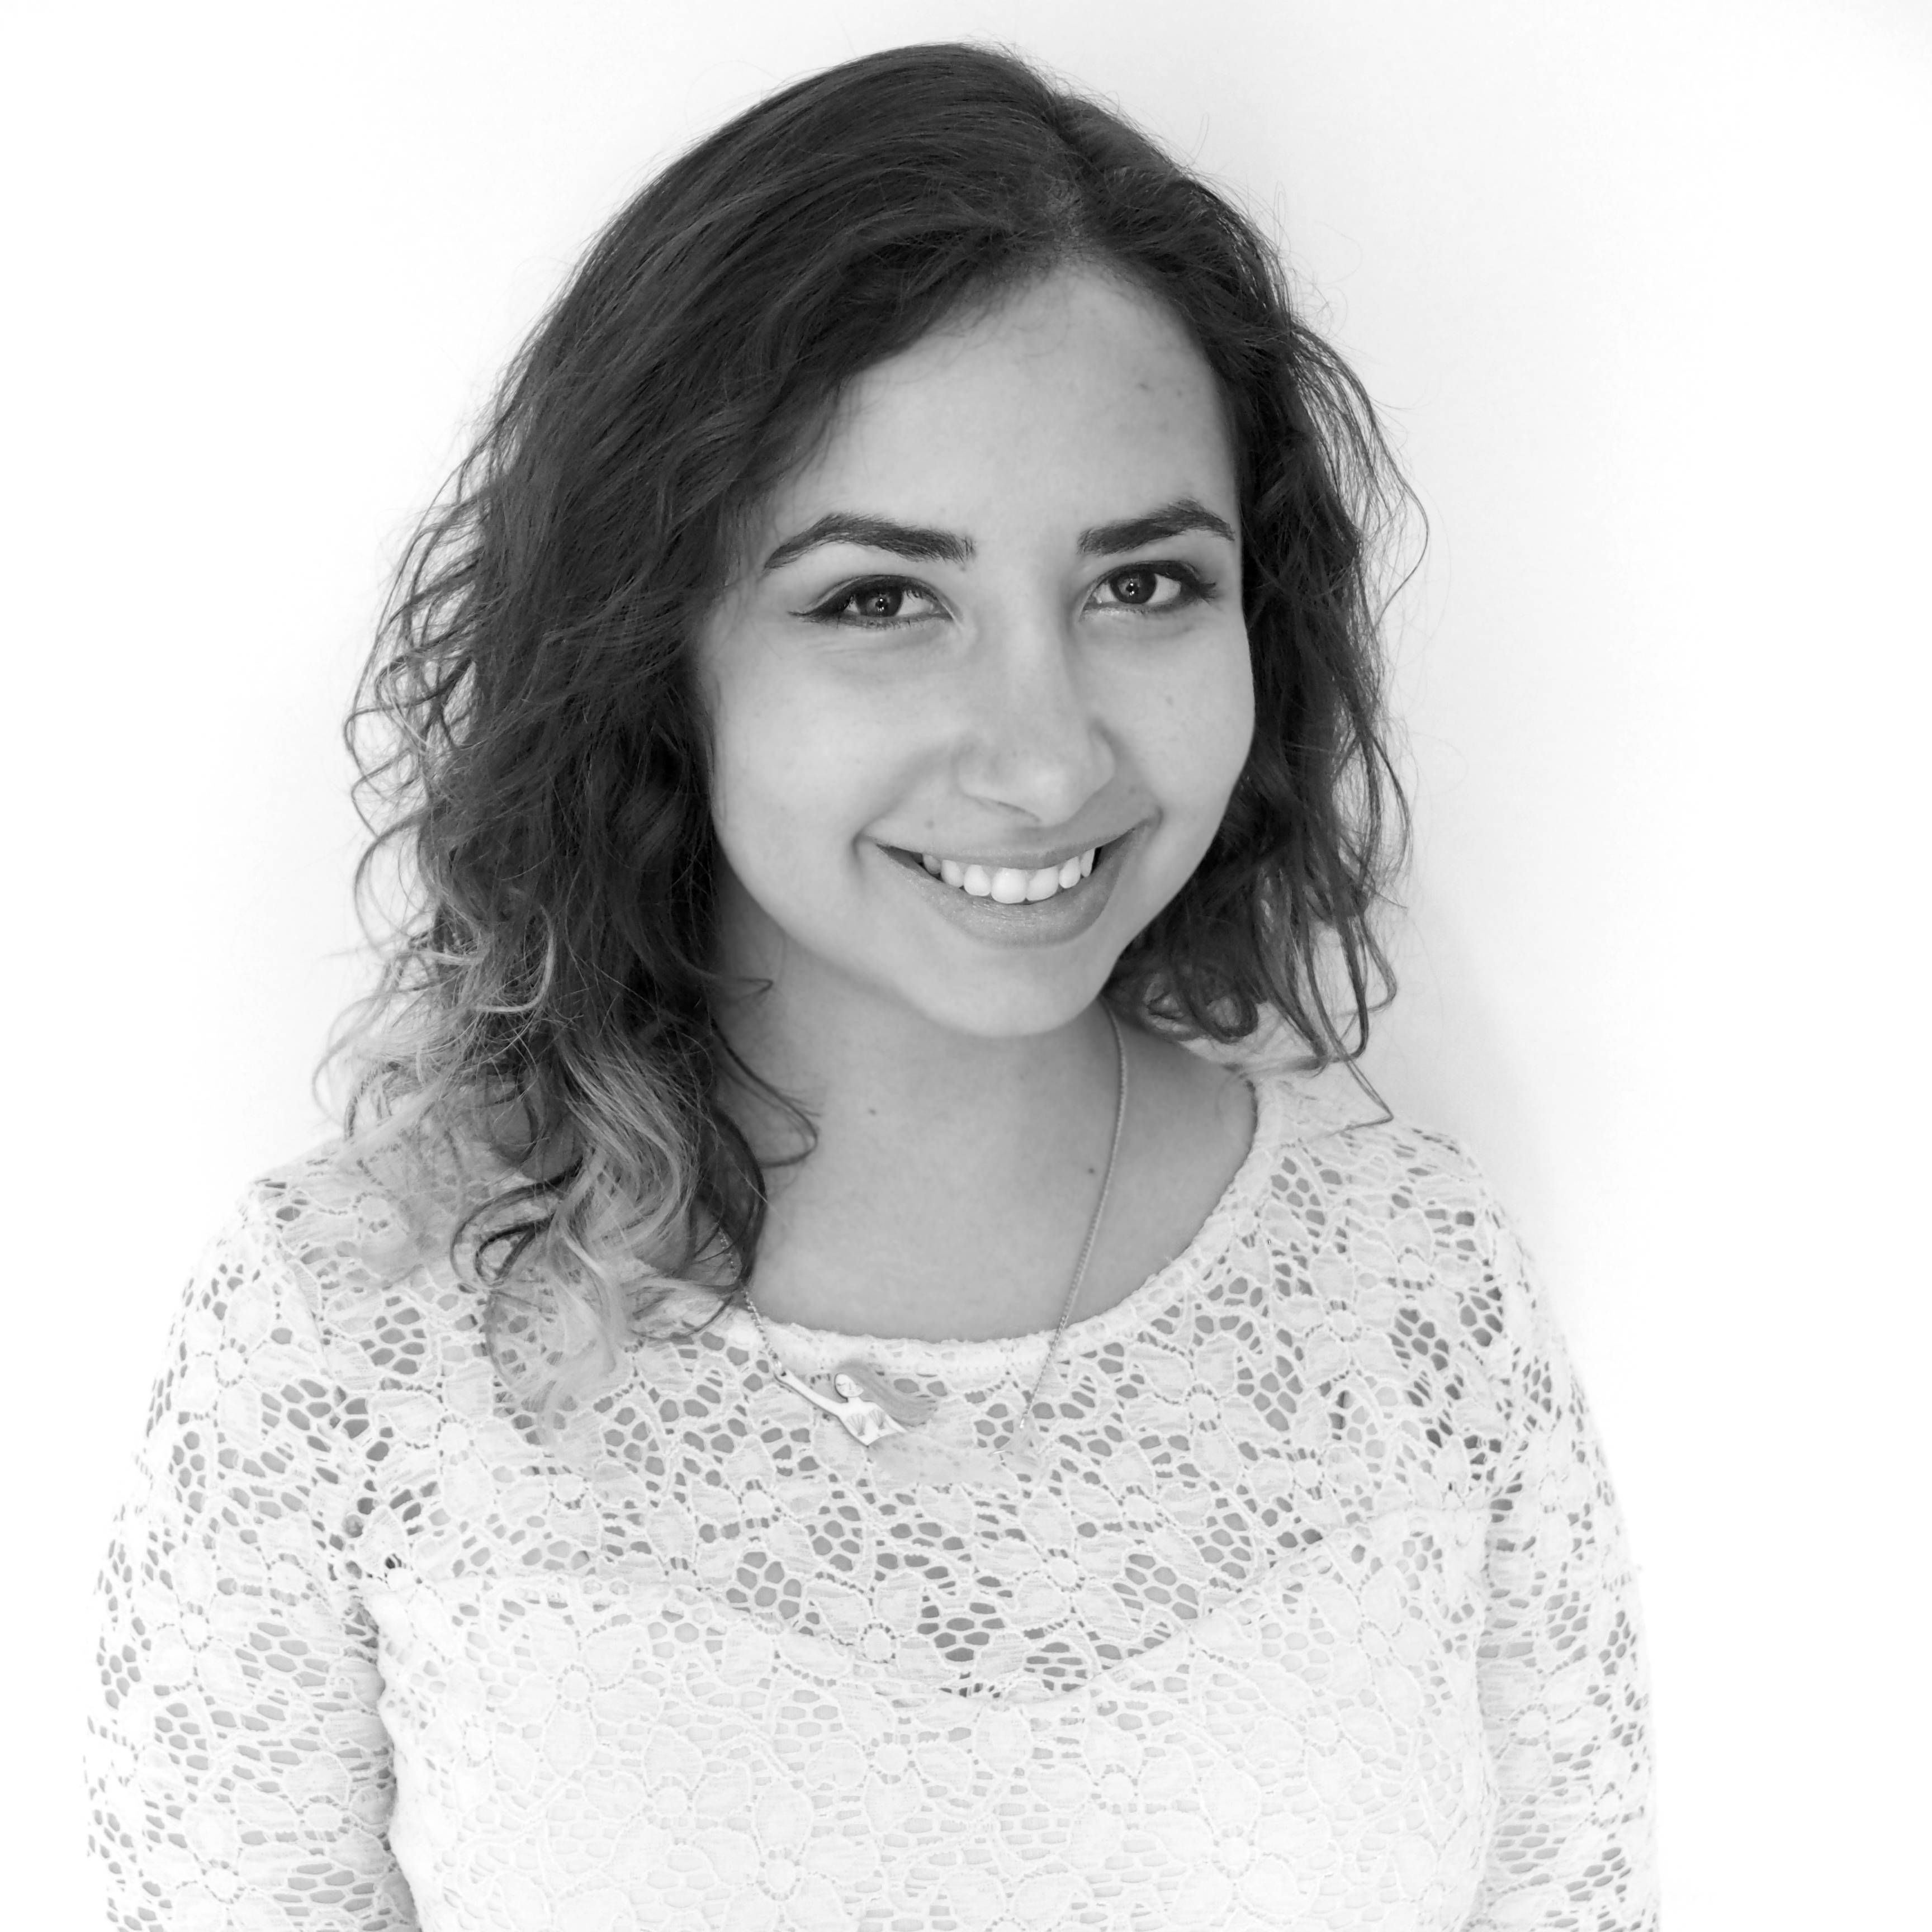 Nadia Garces